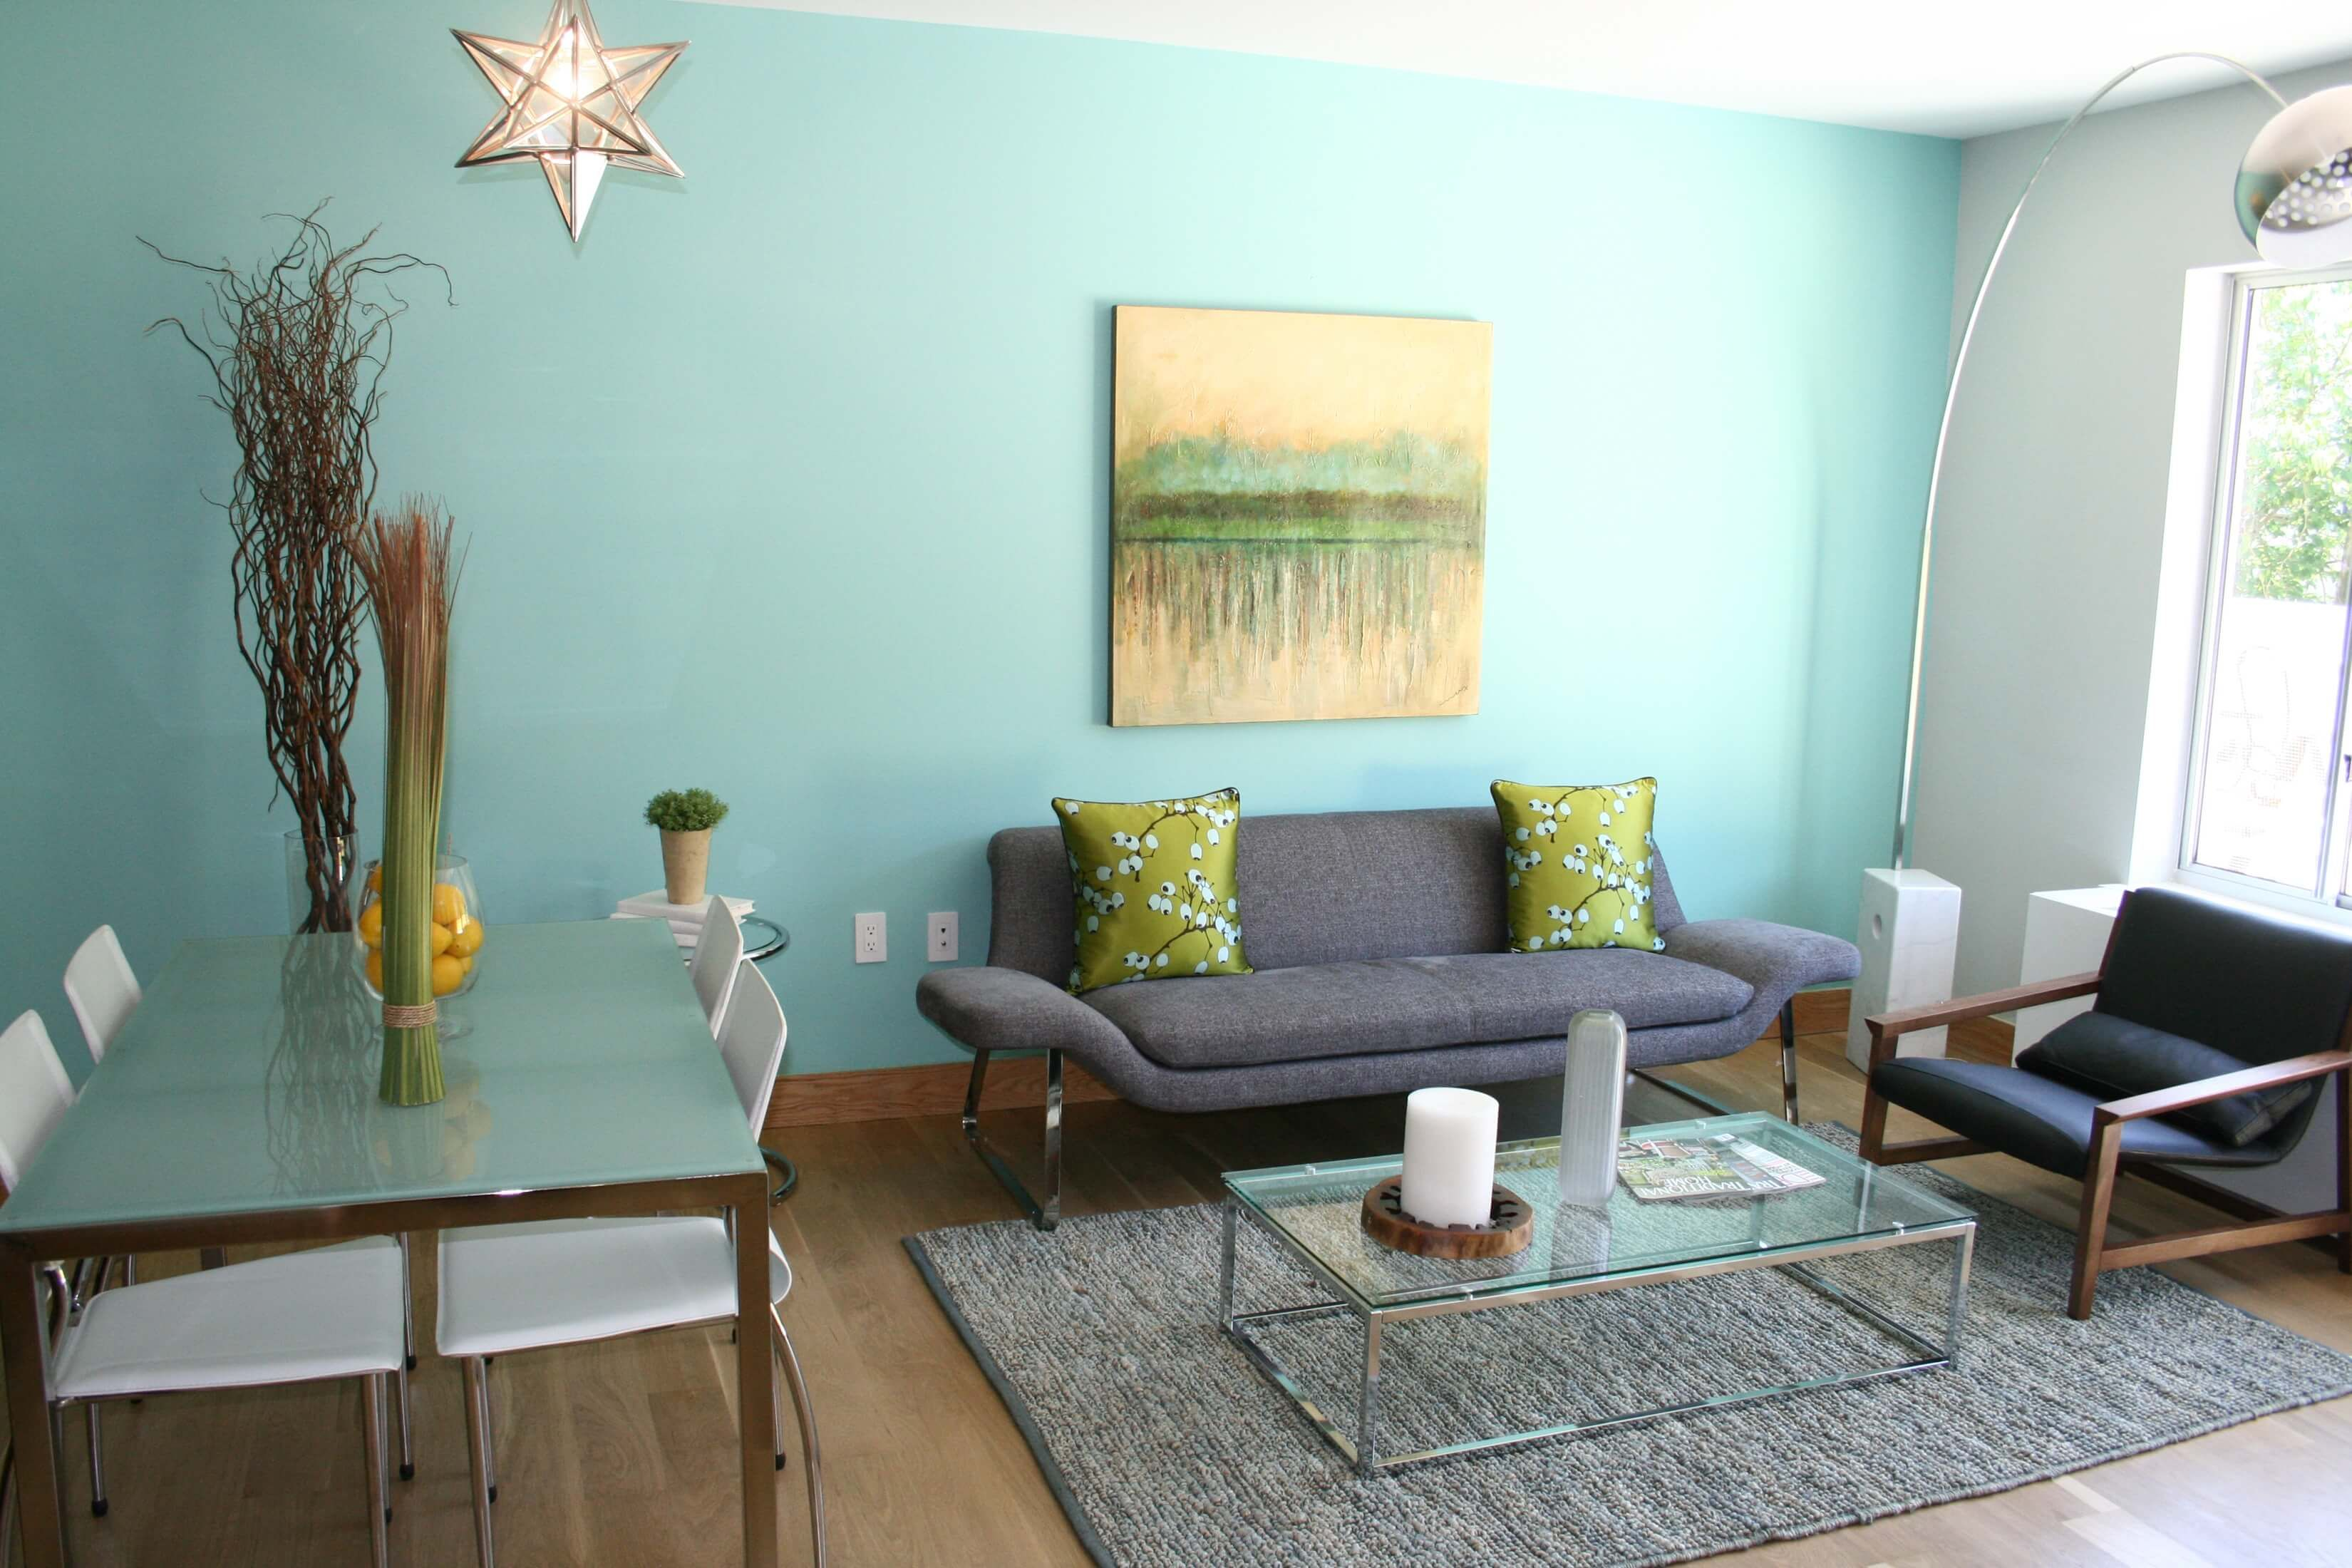 diy livingroom decor ideas in 2020 small apartment on stunning minimalist apartment décor ideas home decor for your small apartment id=36978